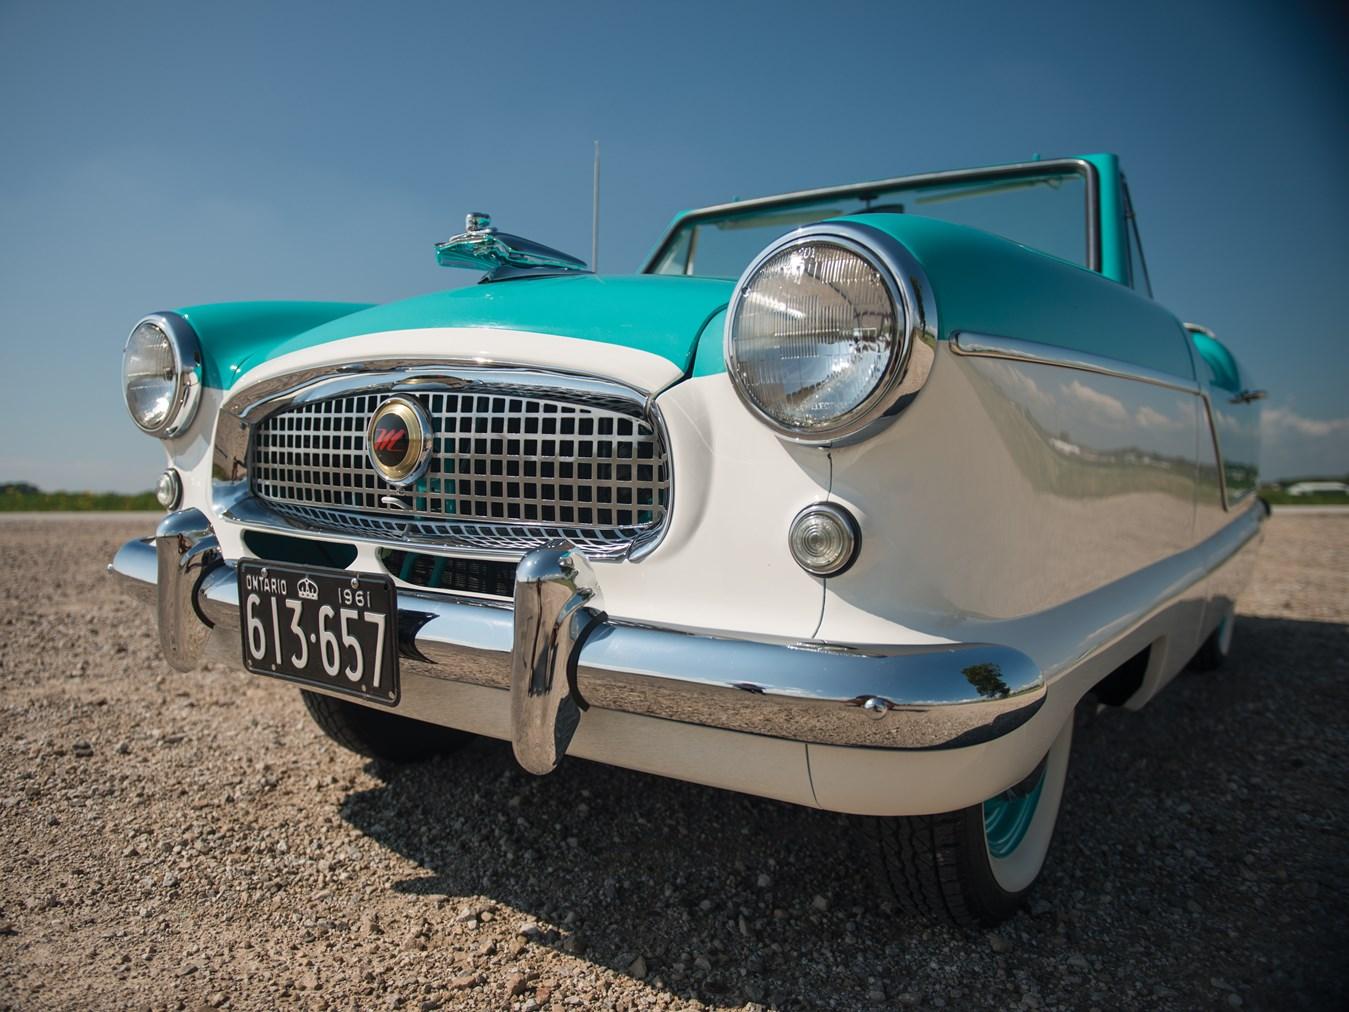 1961 AMC Metropolitan 1500 Convertible grille detail